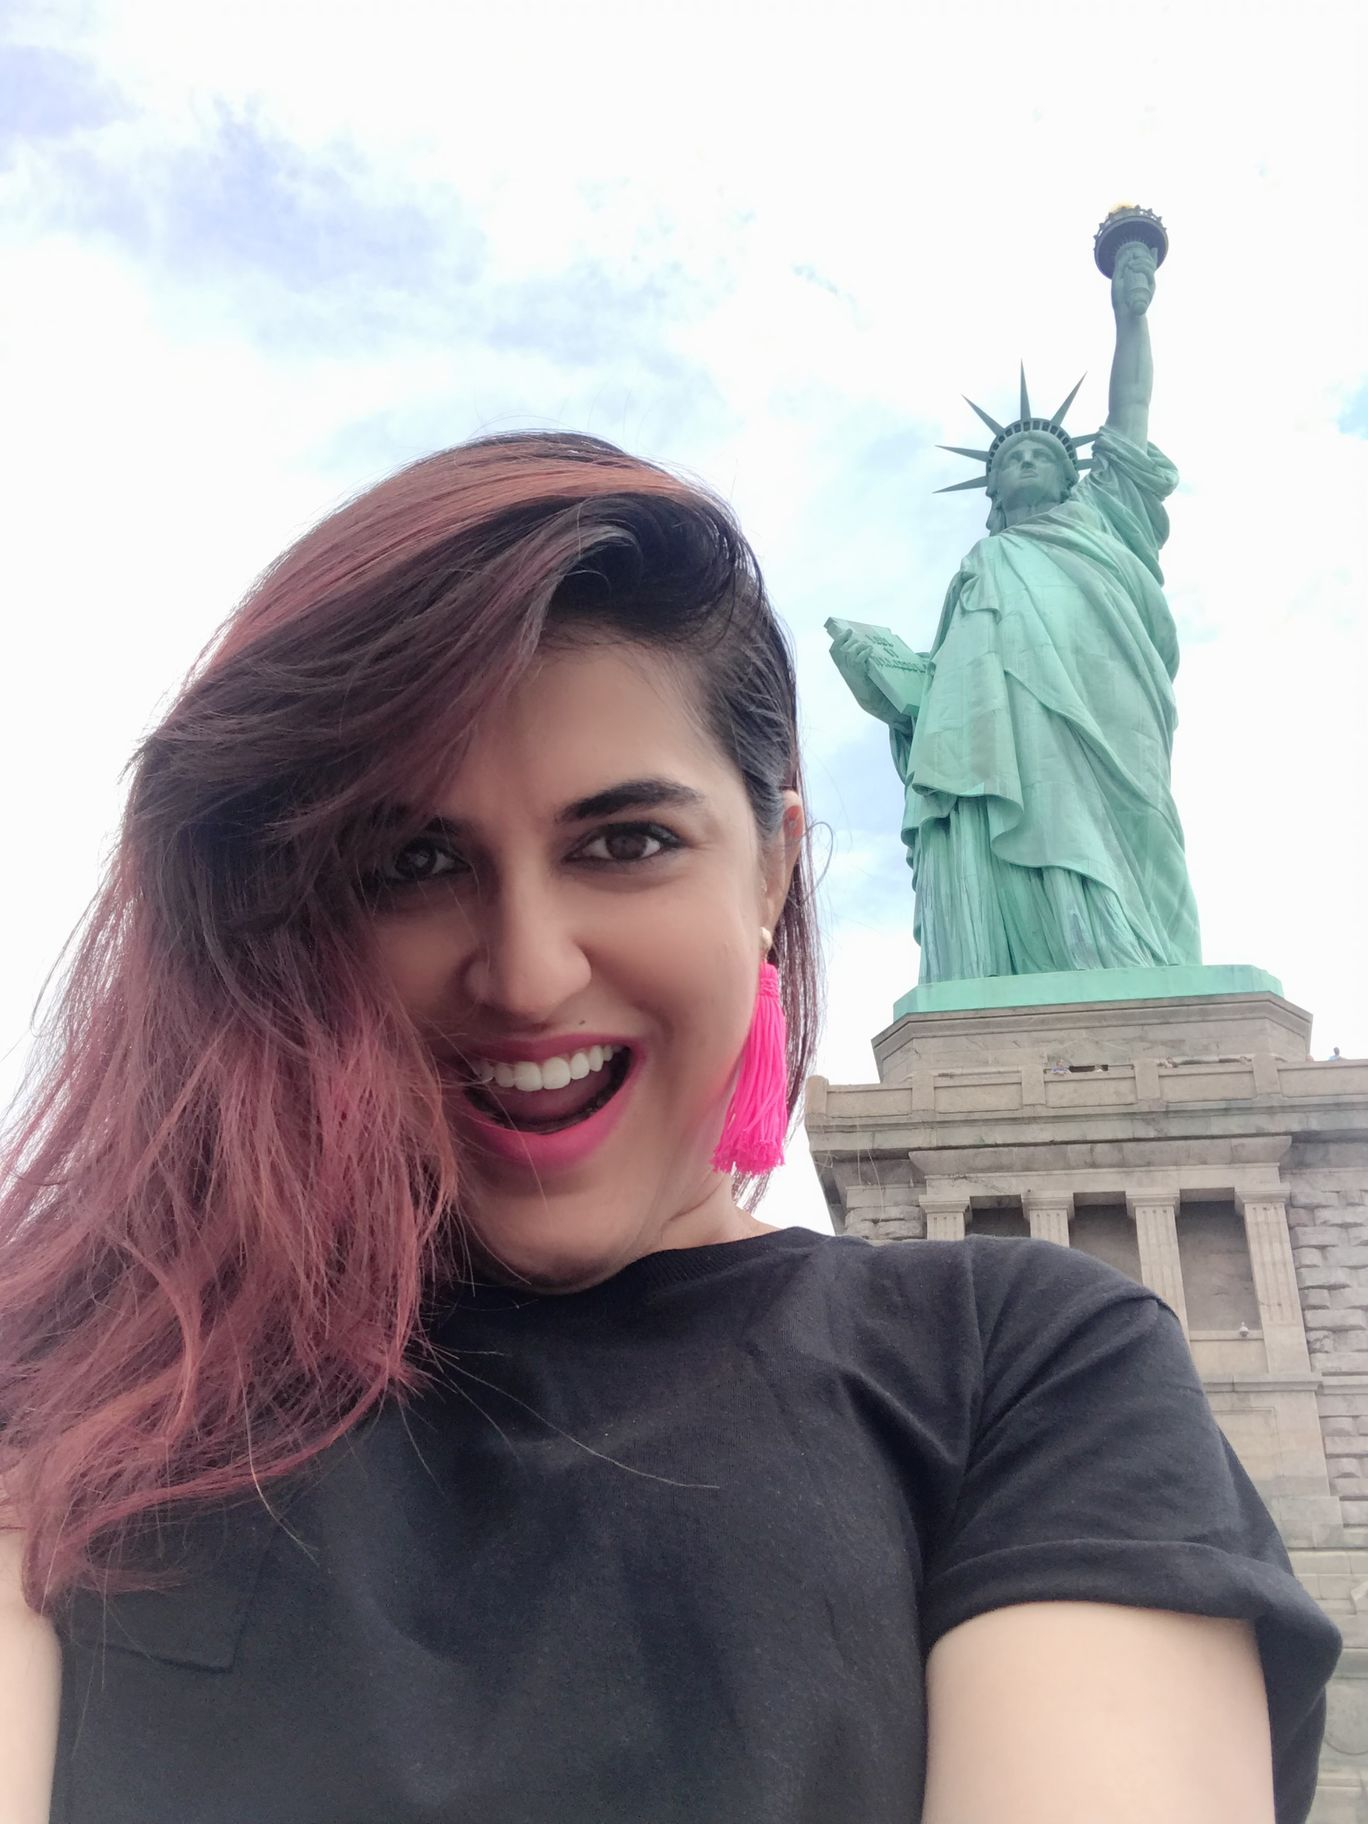 Photo of Statue of Liberty By Charu Vyas